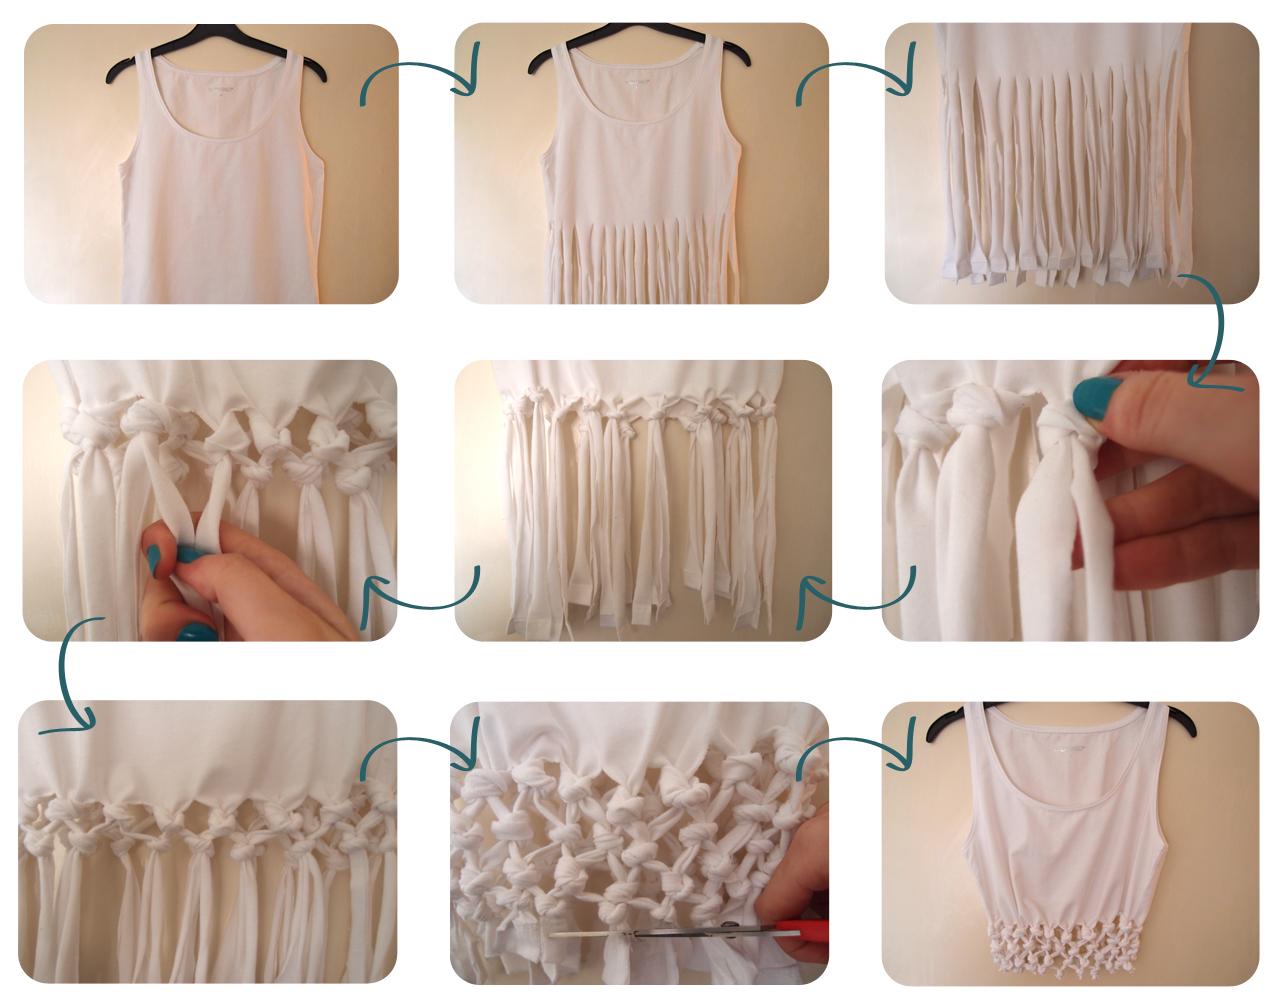 cut shirt designs new t shirt design t shirt cutting ideas cropped 25 diy - T Shirt Design Ideas Cutting